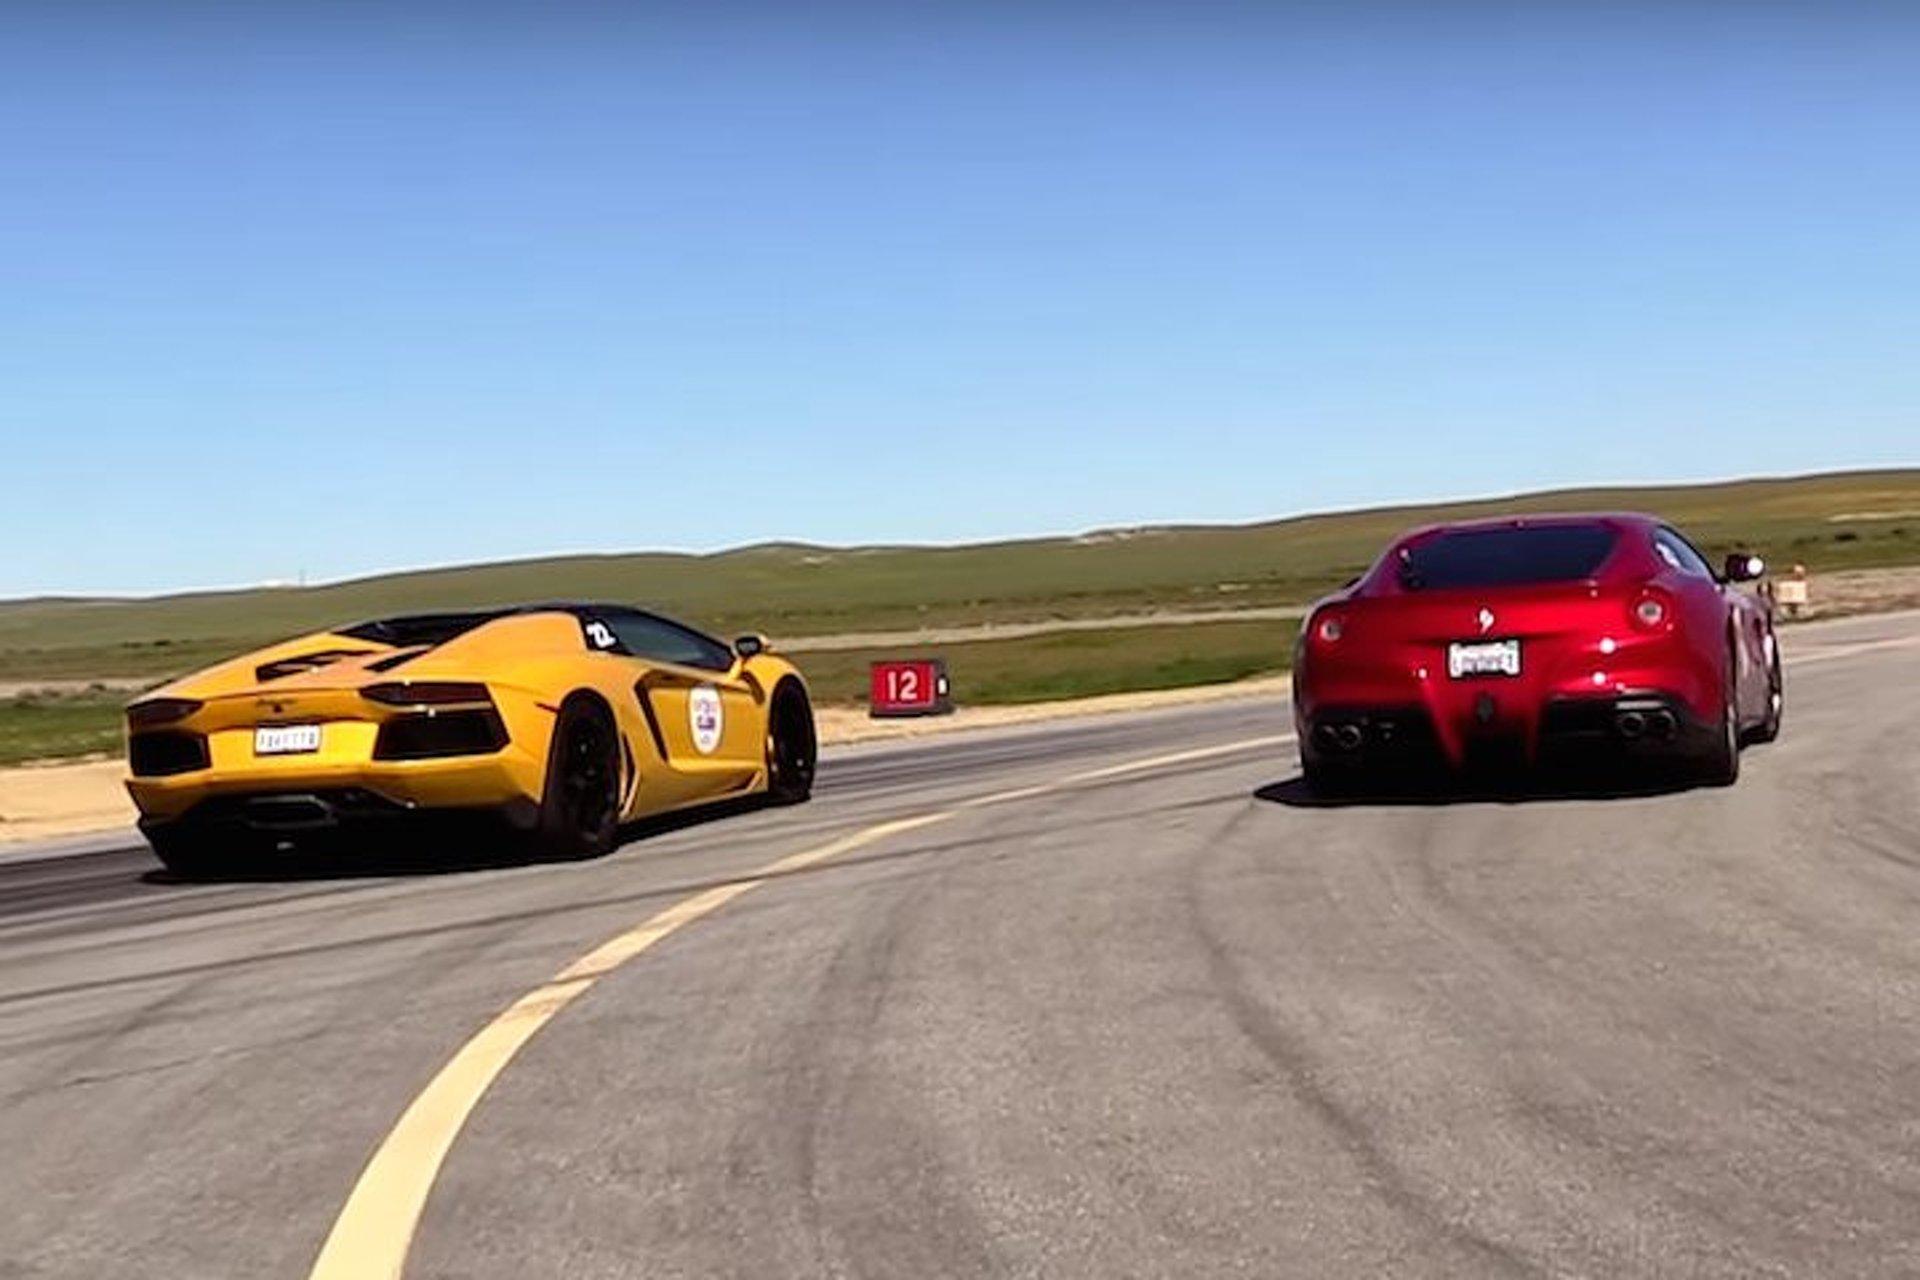 Watch A Ferrari F12 And Lamborghini Aventador Roadster Hit The Drag